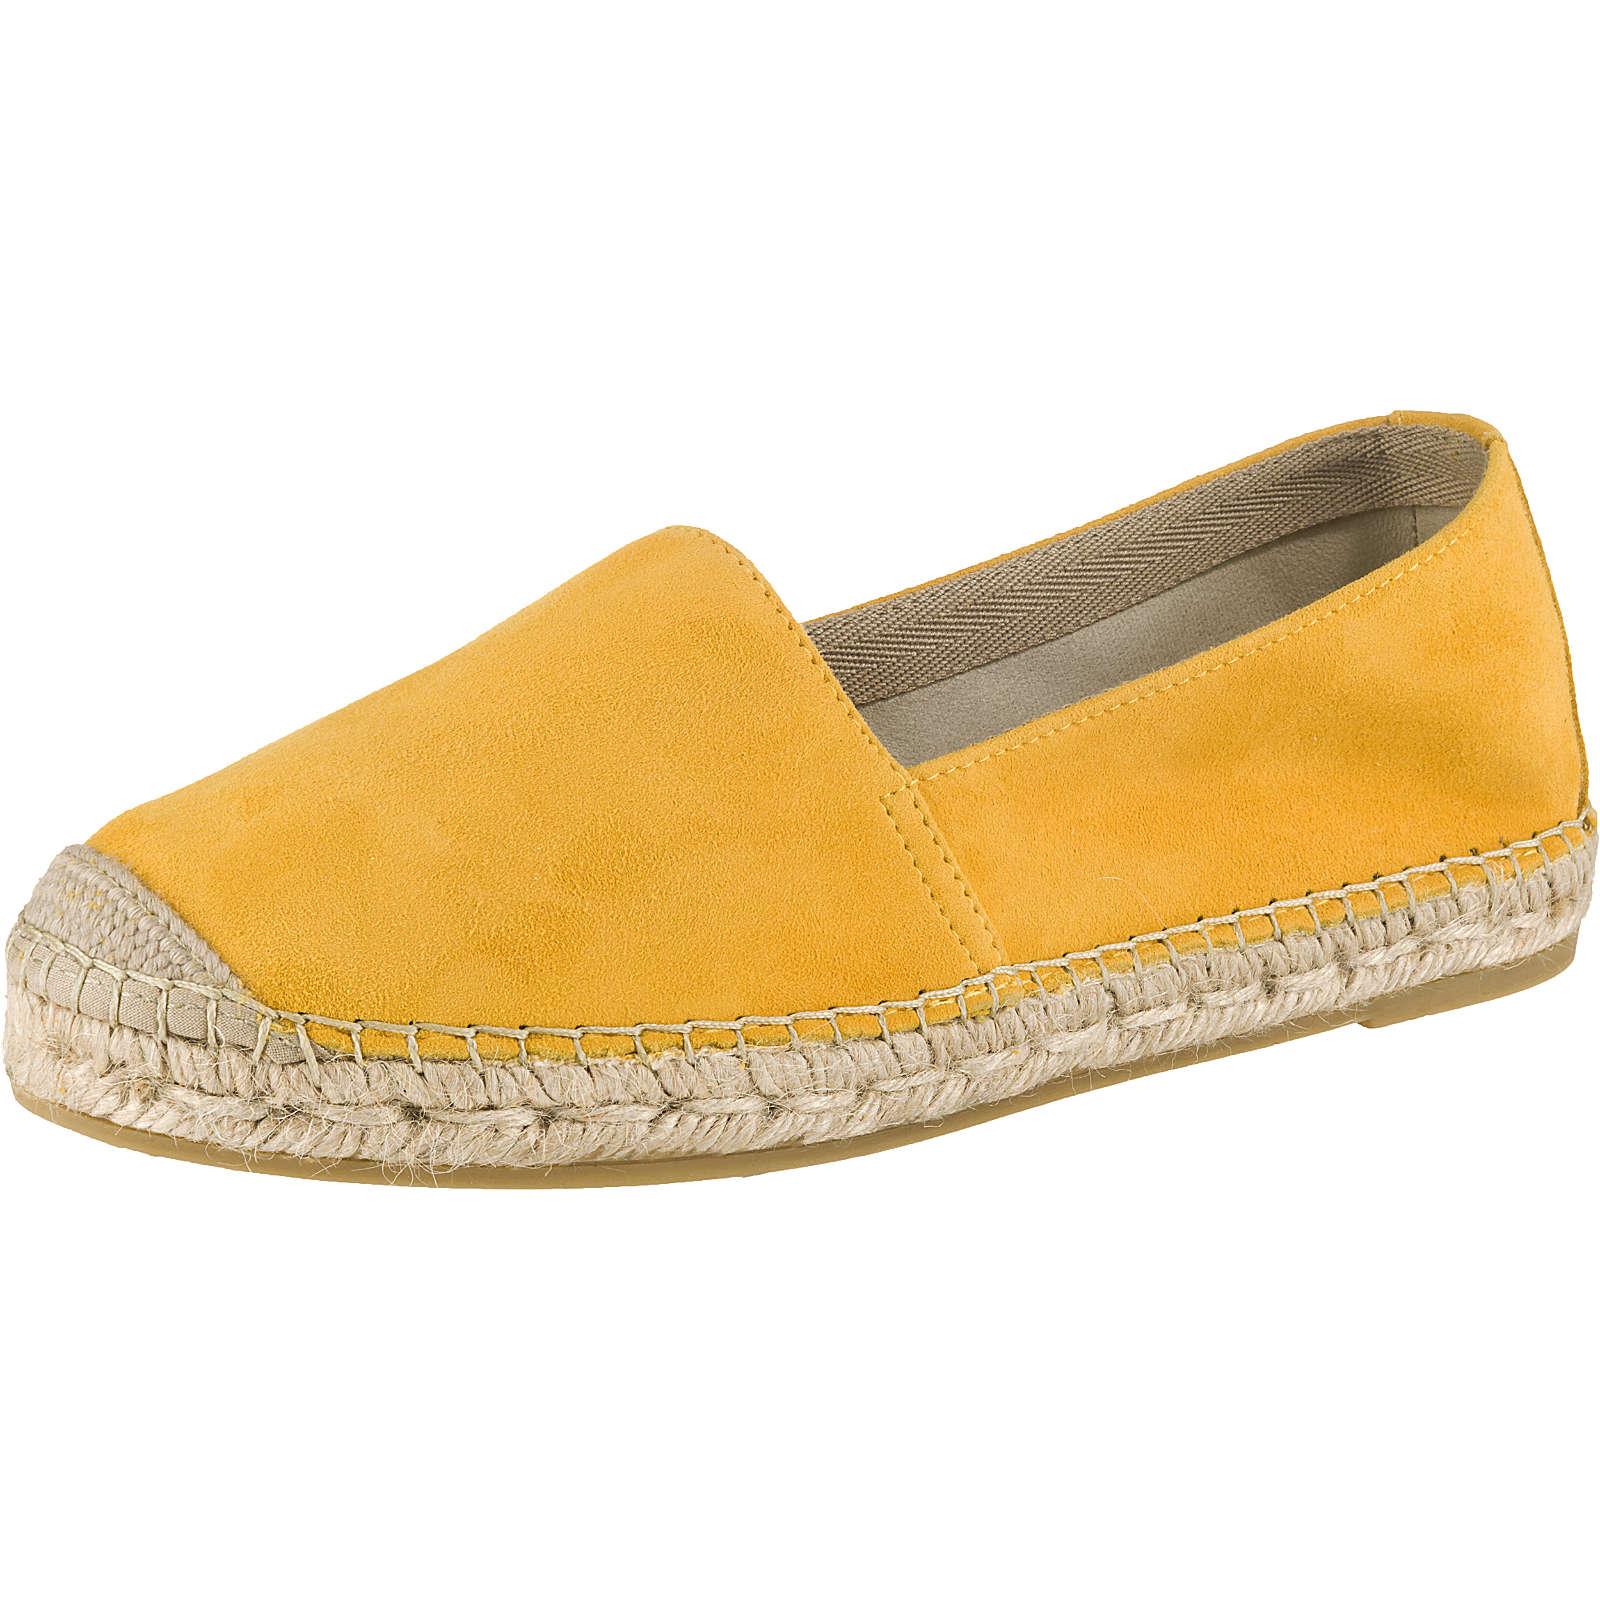 Vidorreta Espadrilles gelb Damen Gr. 36